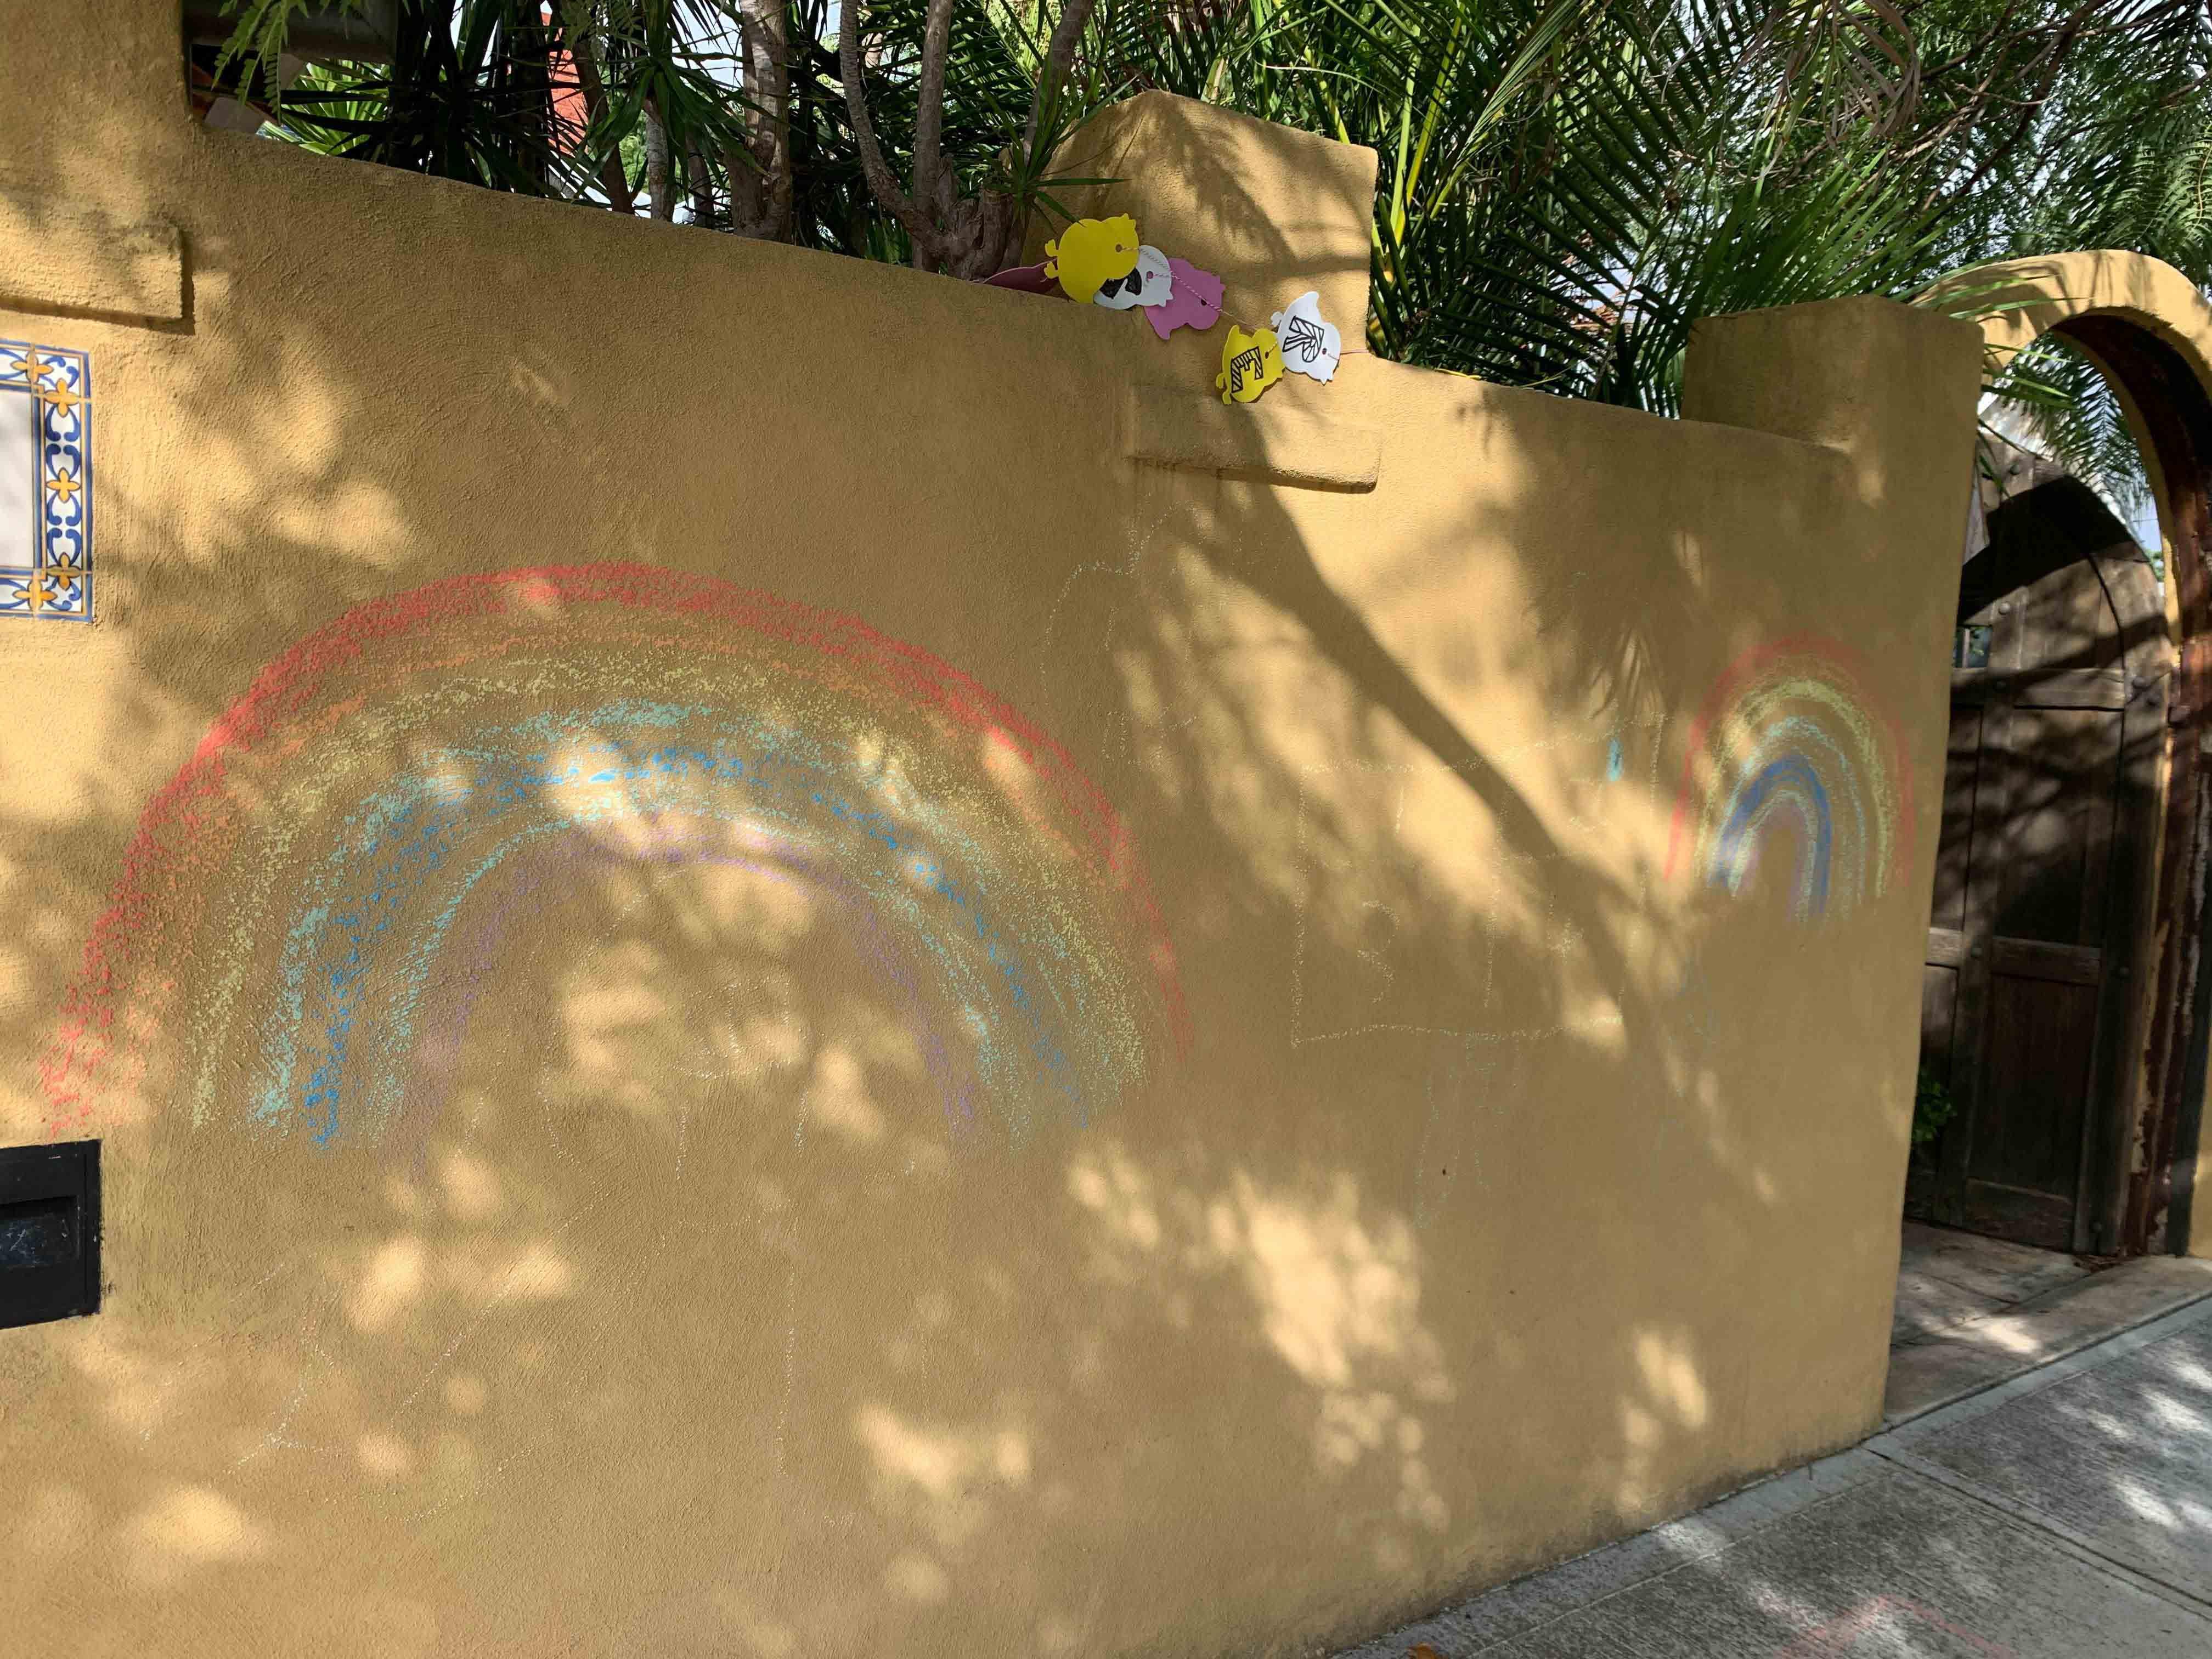 124. North Perth rainbow, March '20